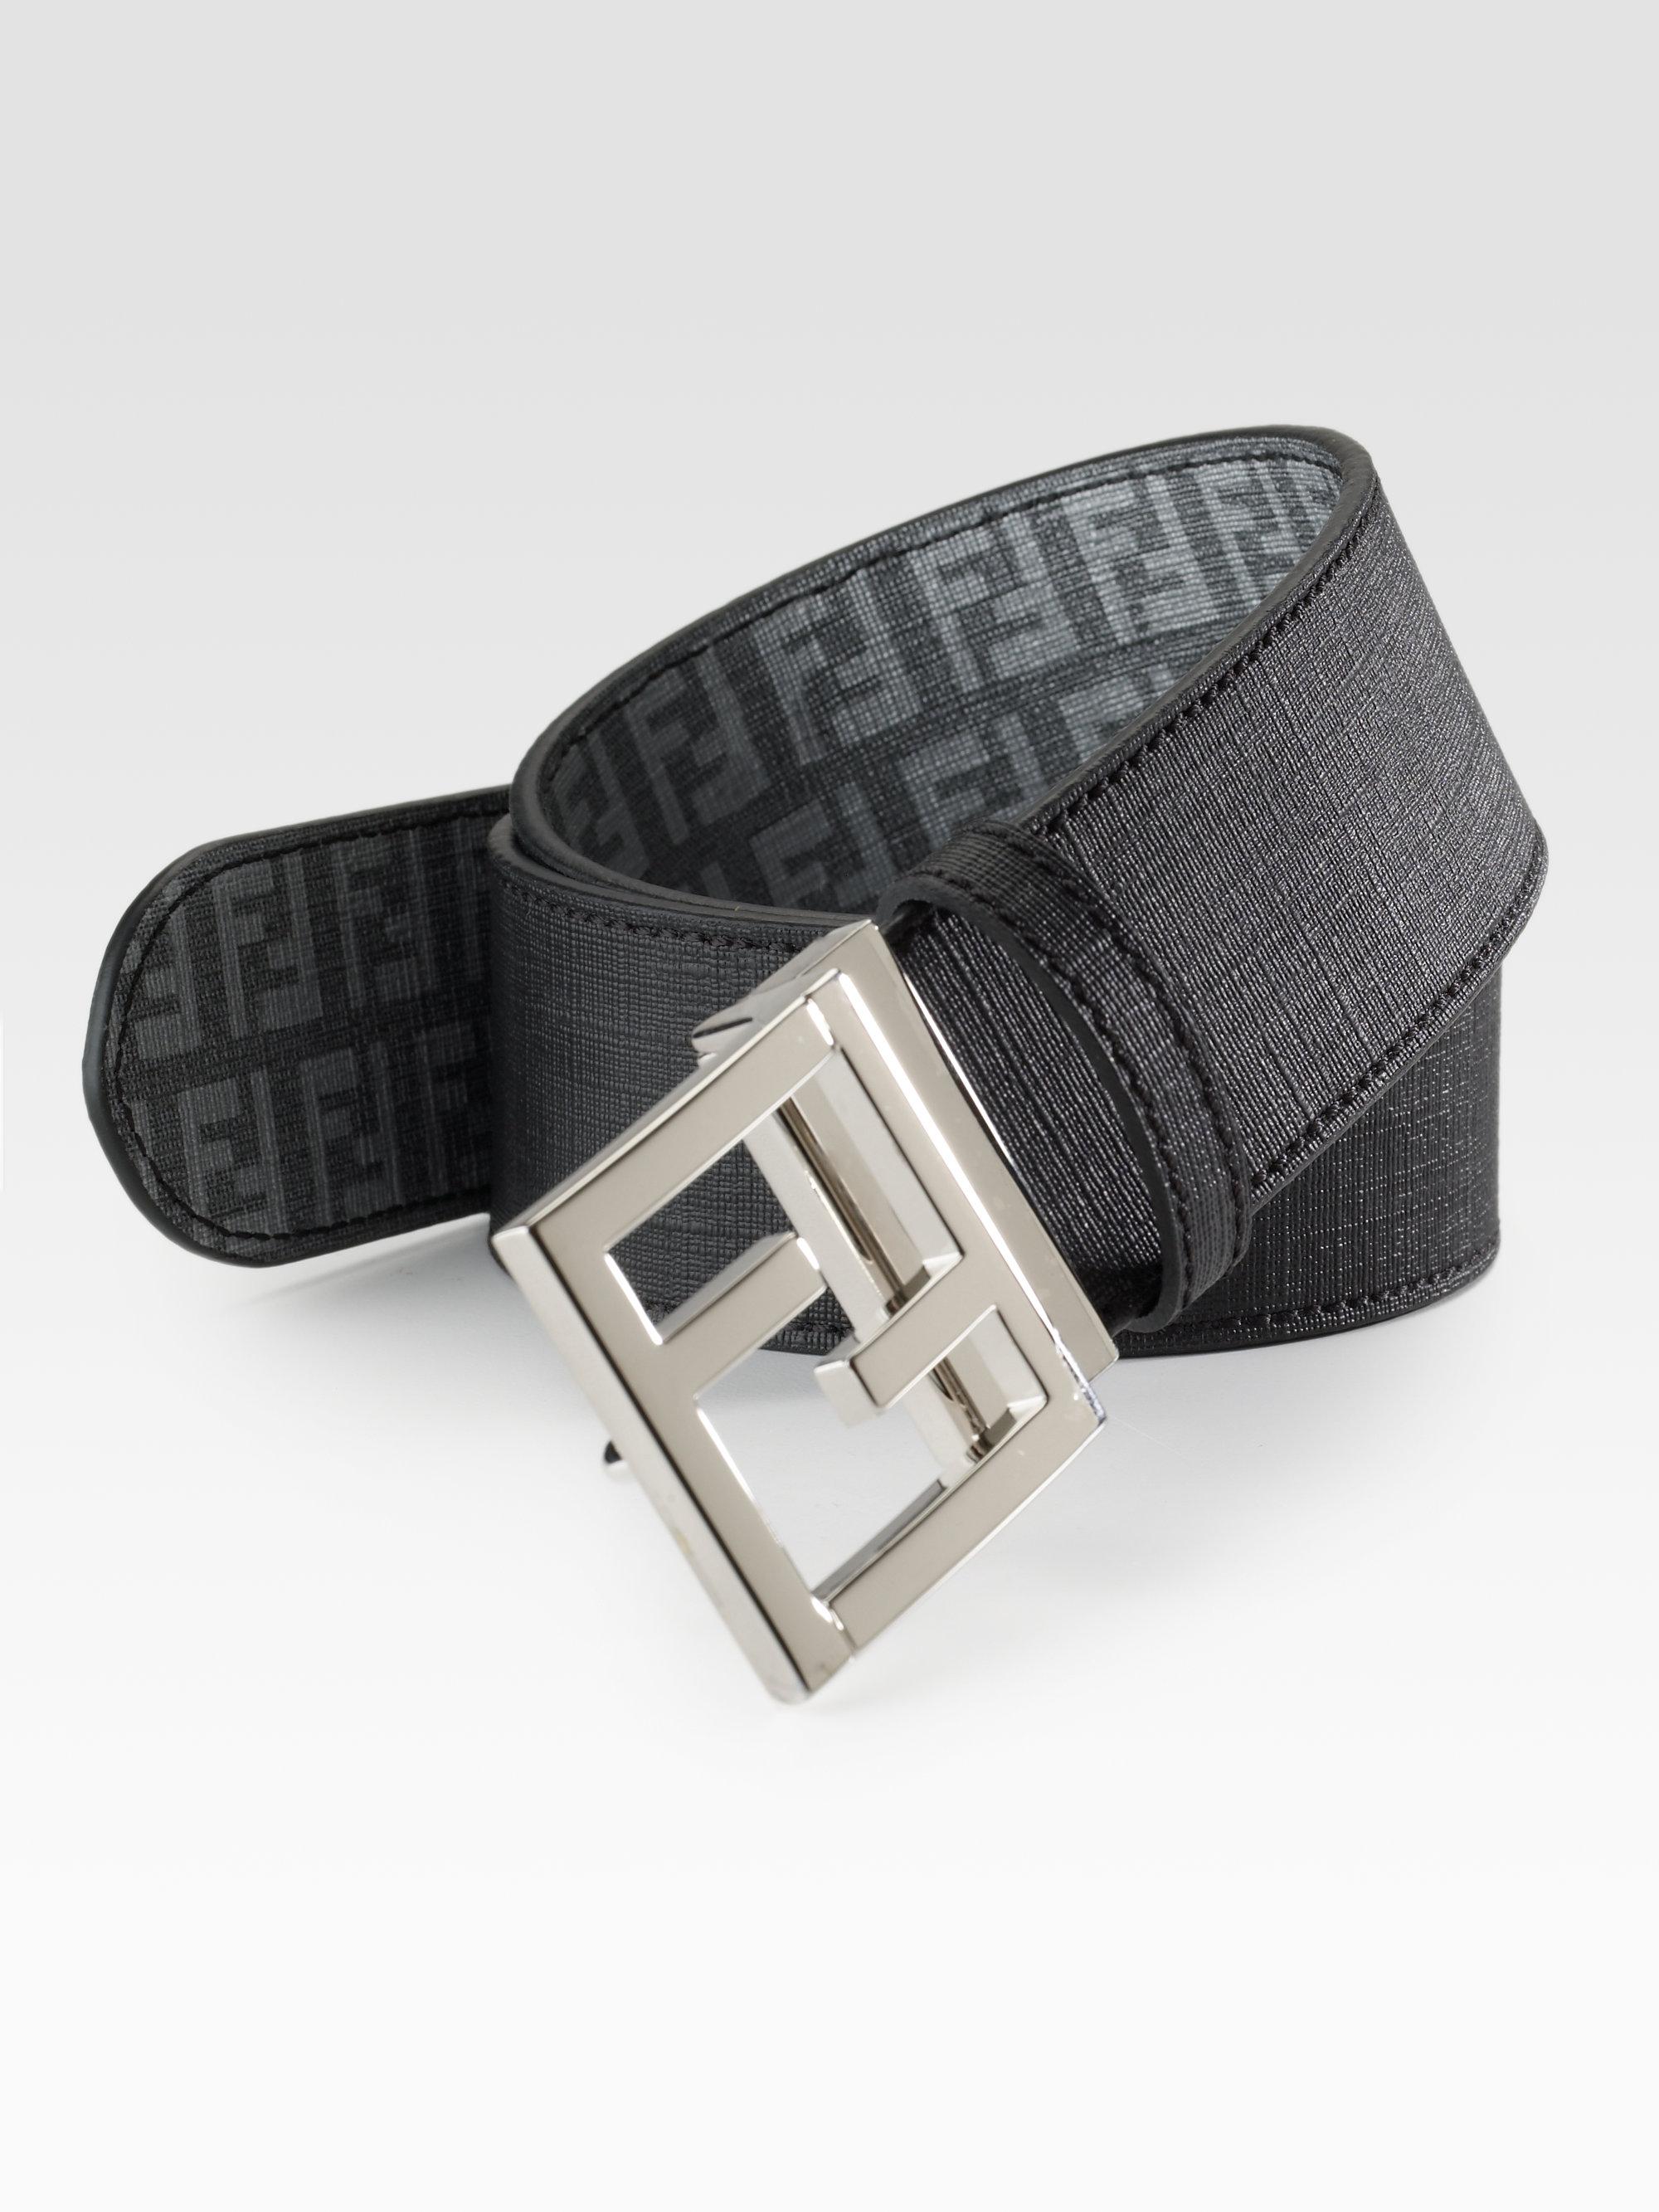 2623adfe25 usa reversible fendi multicolor belt change 68fc6 215d2